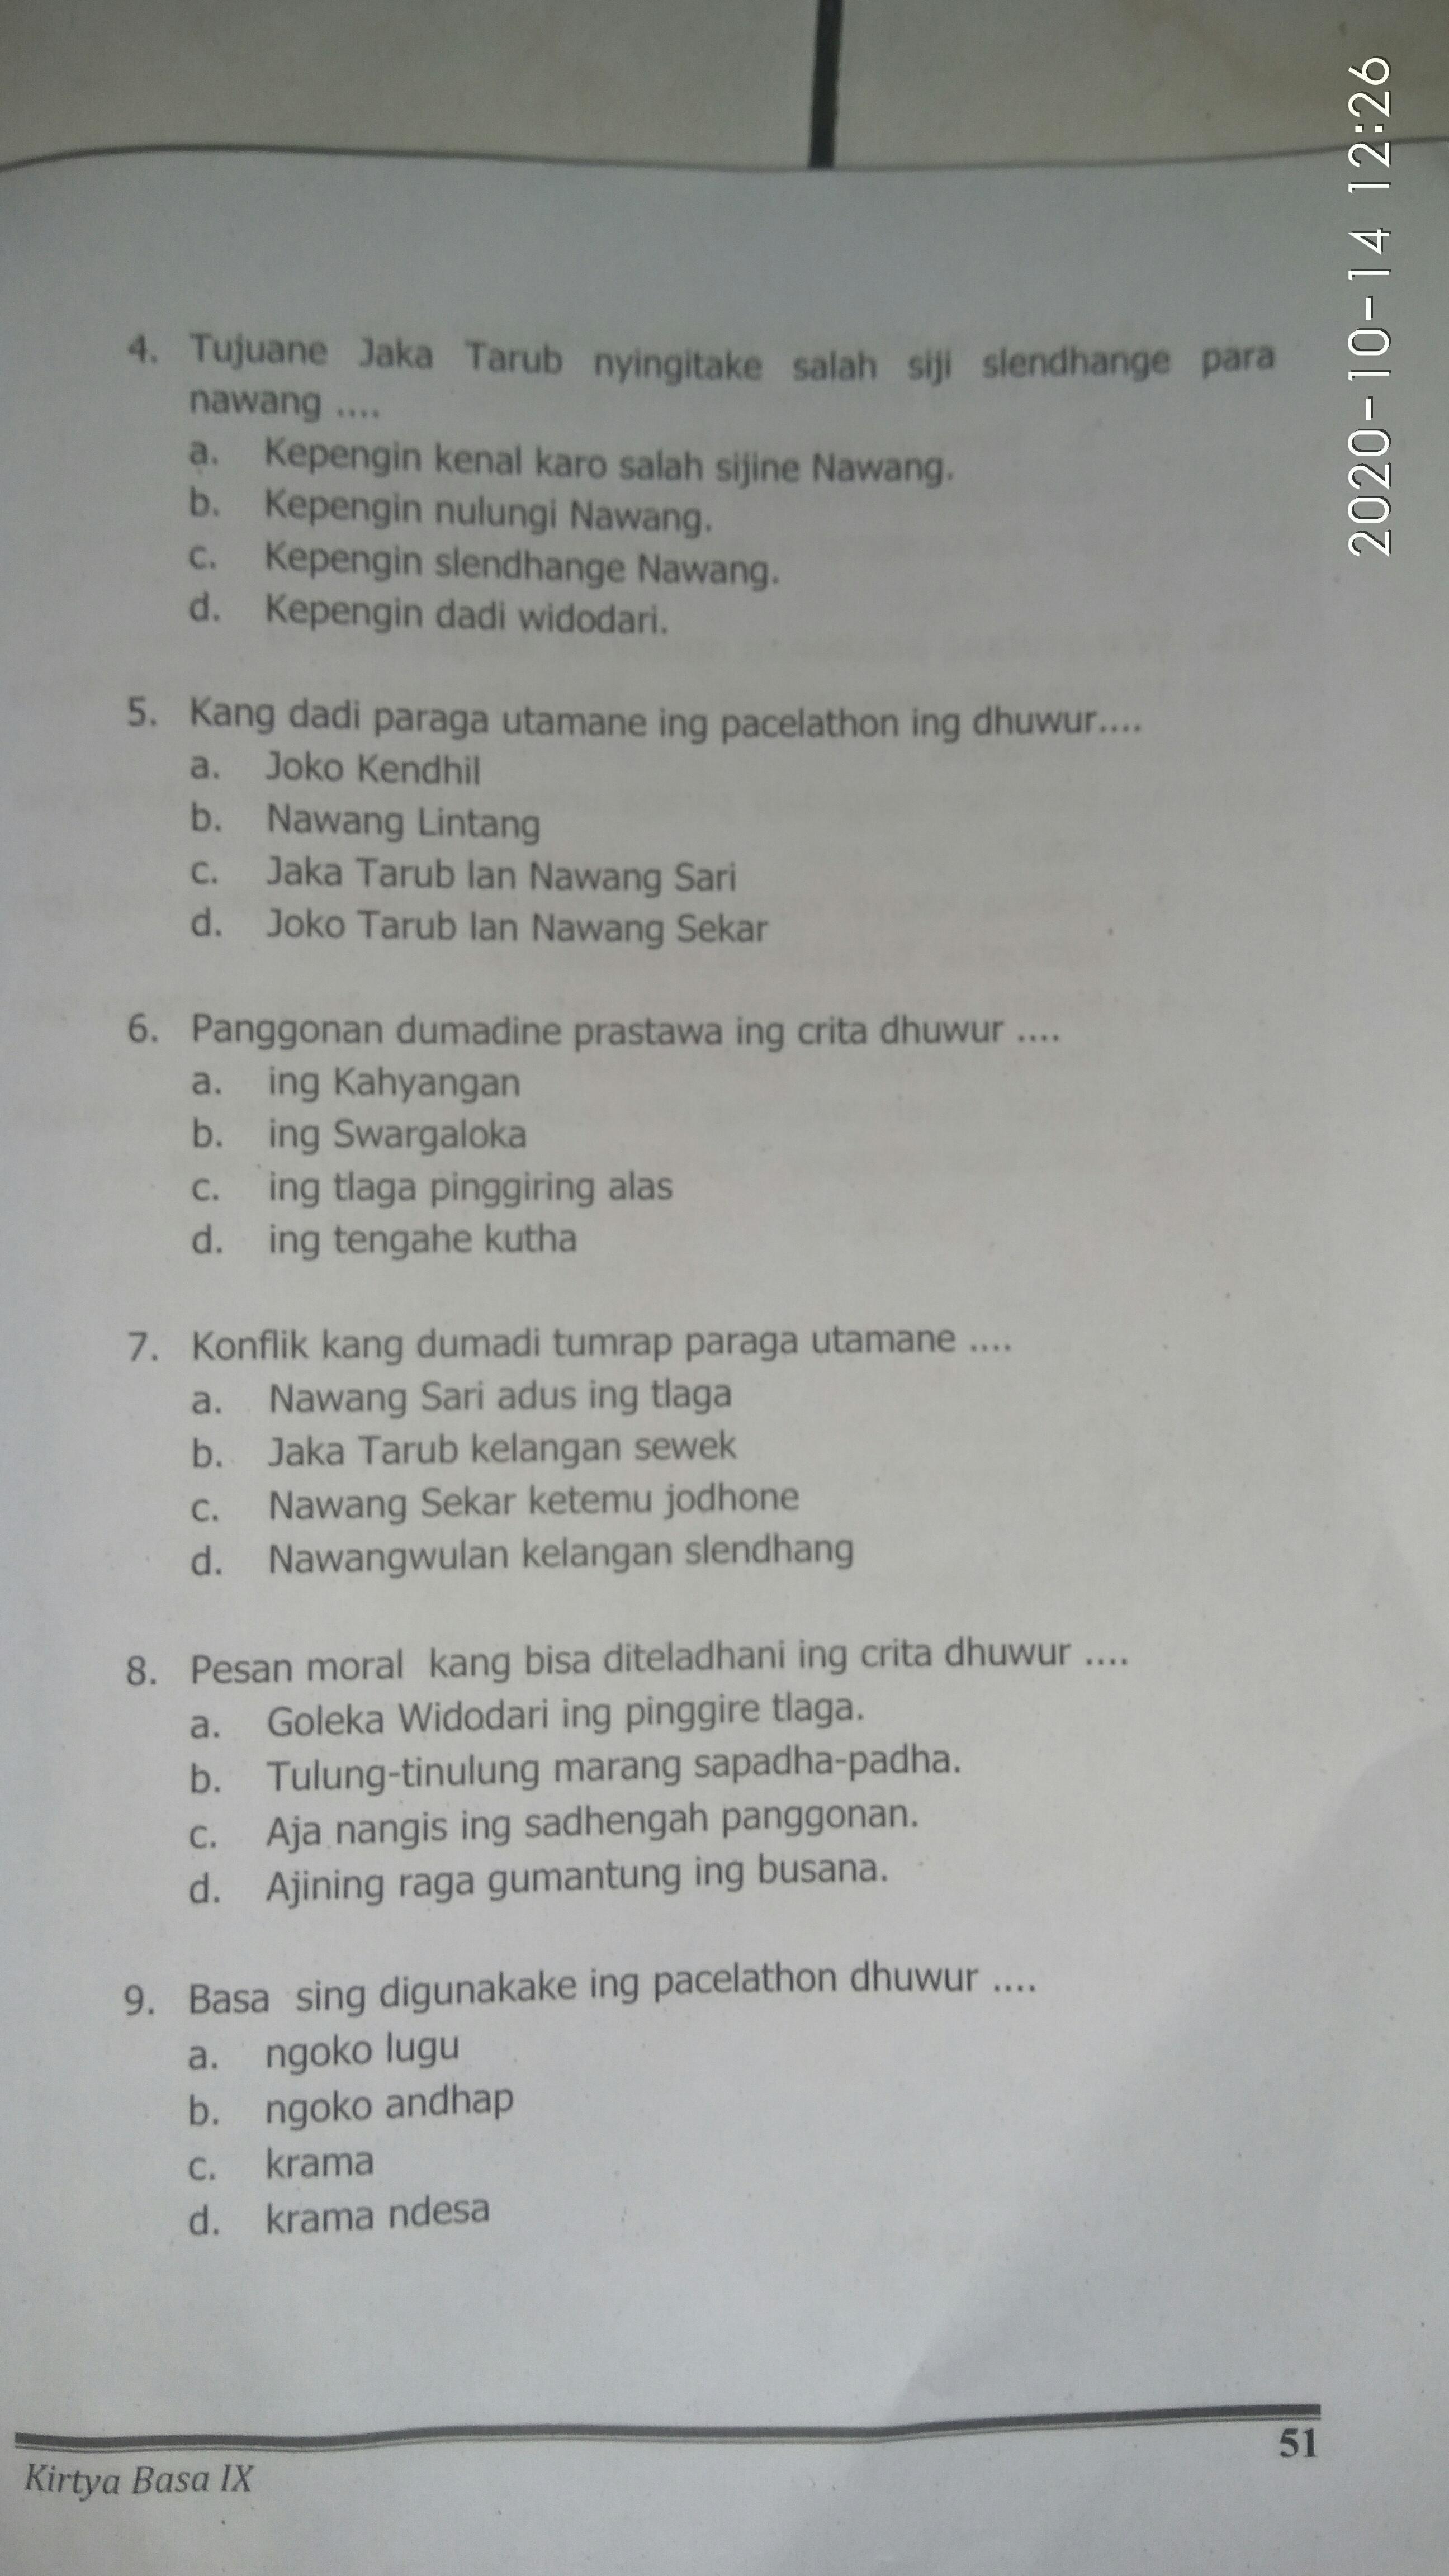 Bahasa Jawa Kelas 9 Uji Kompetisi Wulangan 2 Semester 1 Dikumpulkan Hari Ini Brainly Co Id